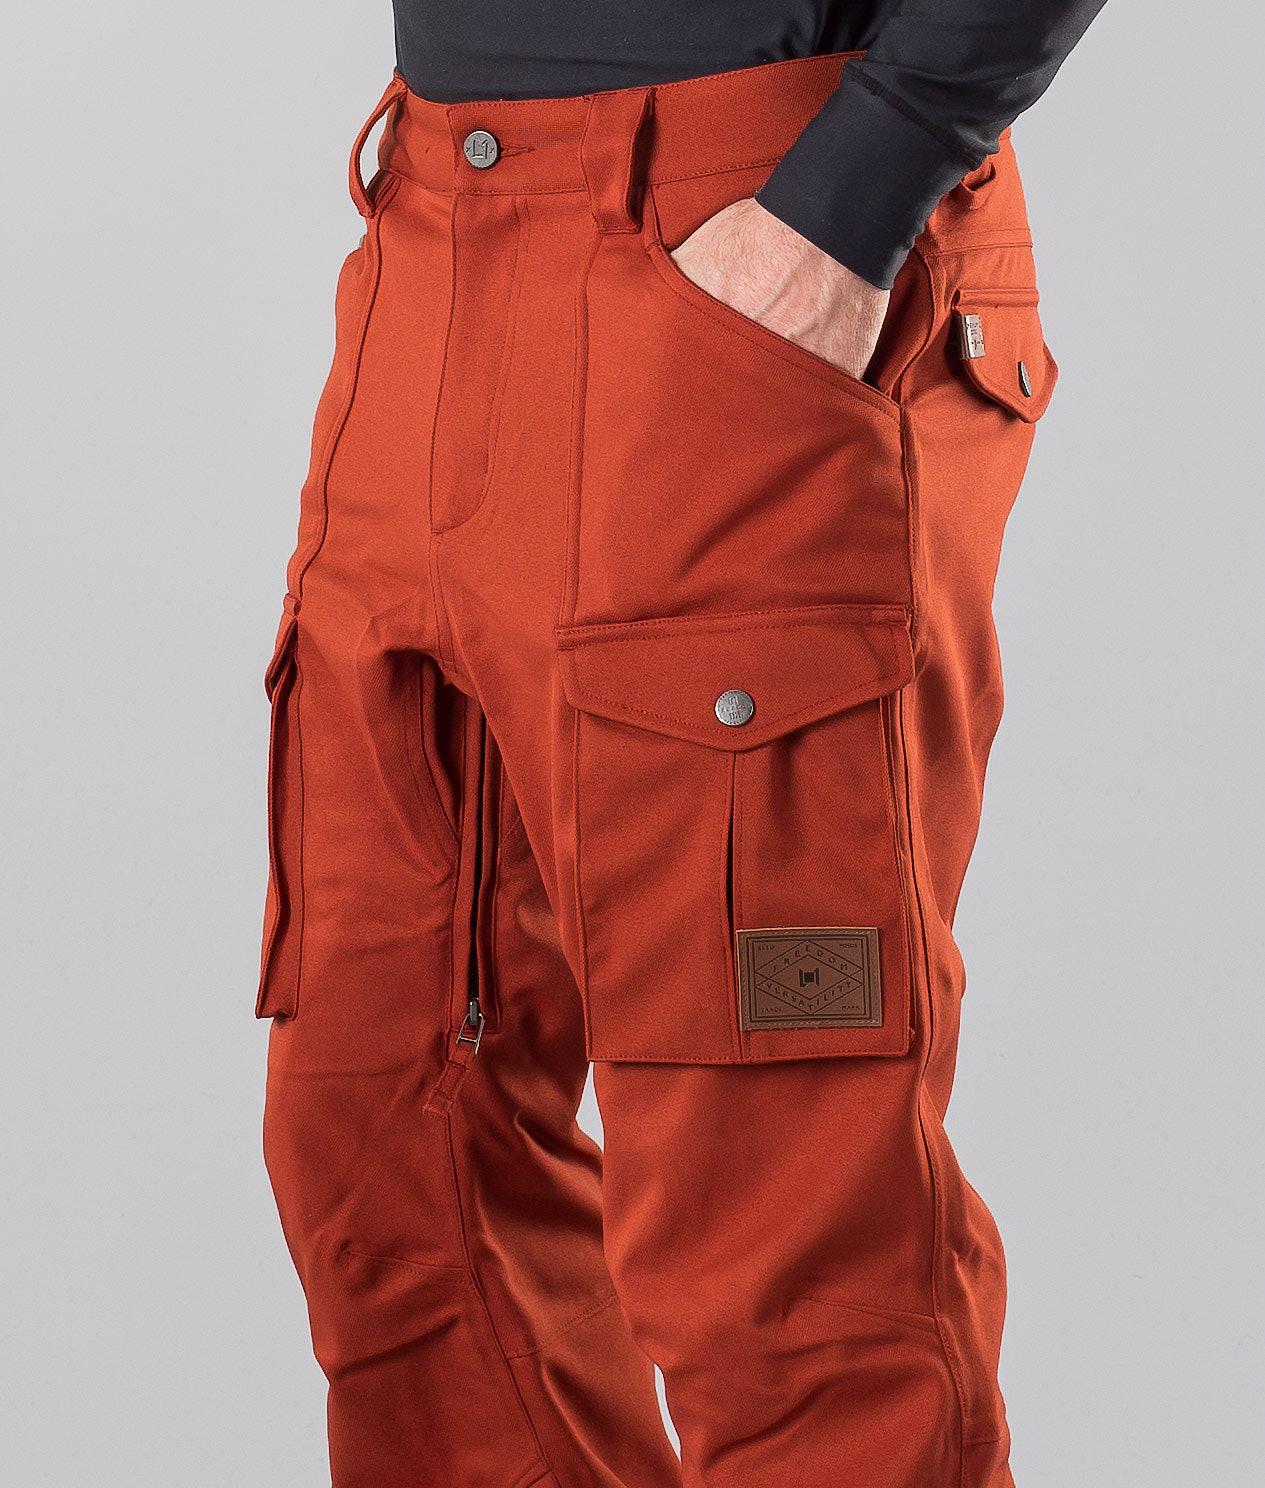 95cc4f1b L1 Slim Cargo Snow Pants Rust - Ridestore.com